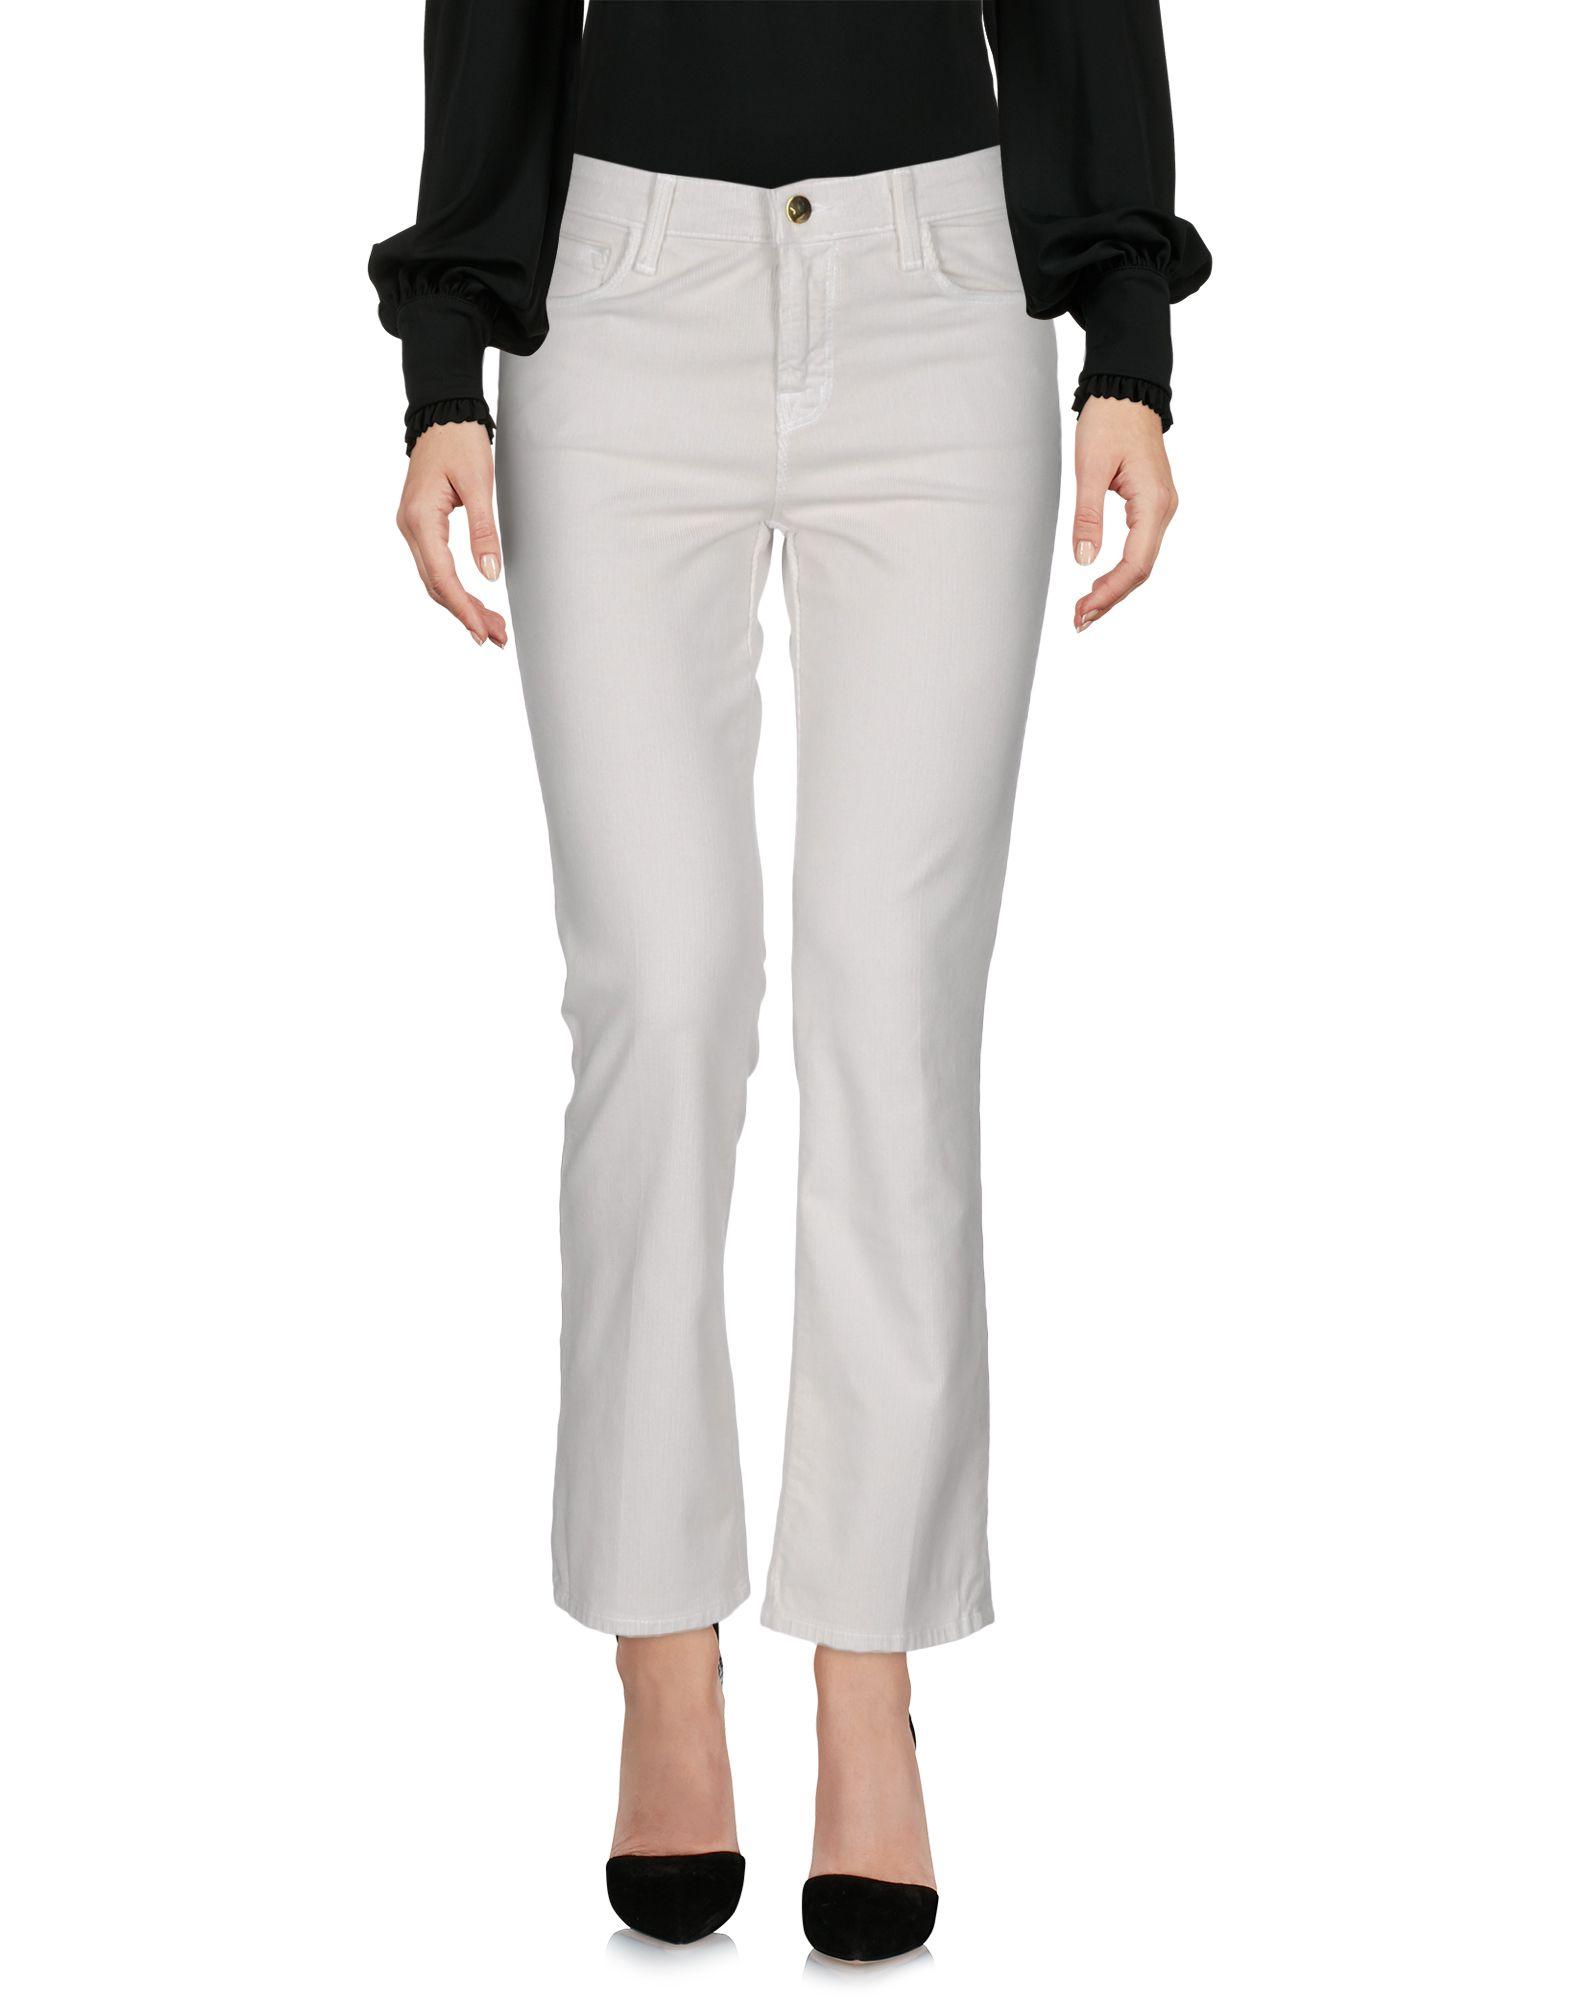 Pantalone J Brand Donna - Acquista online su K8P5nUy